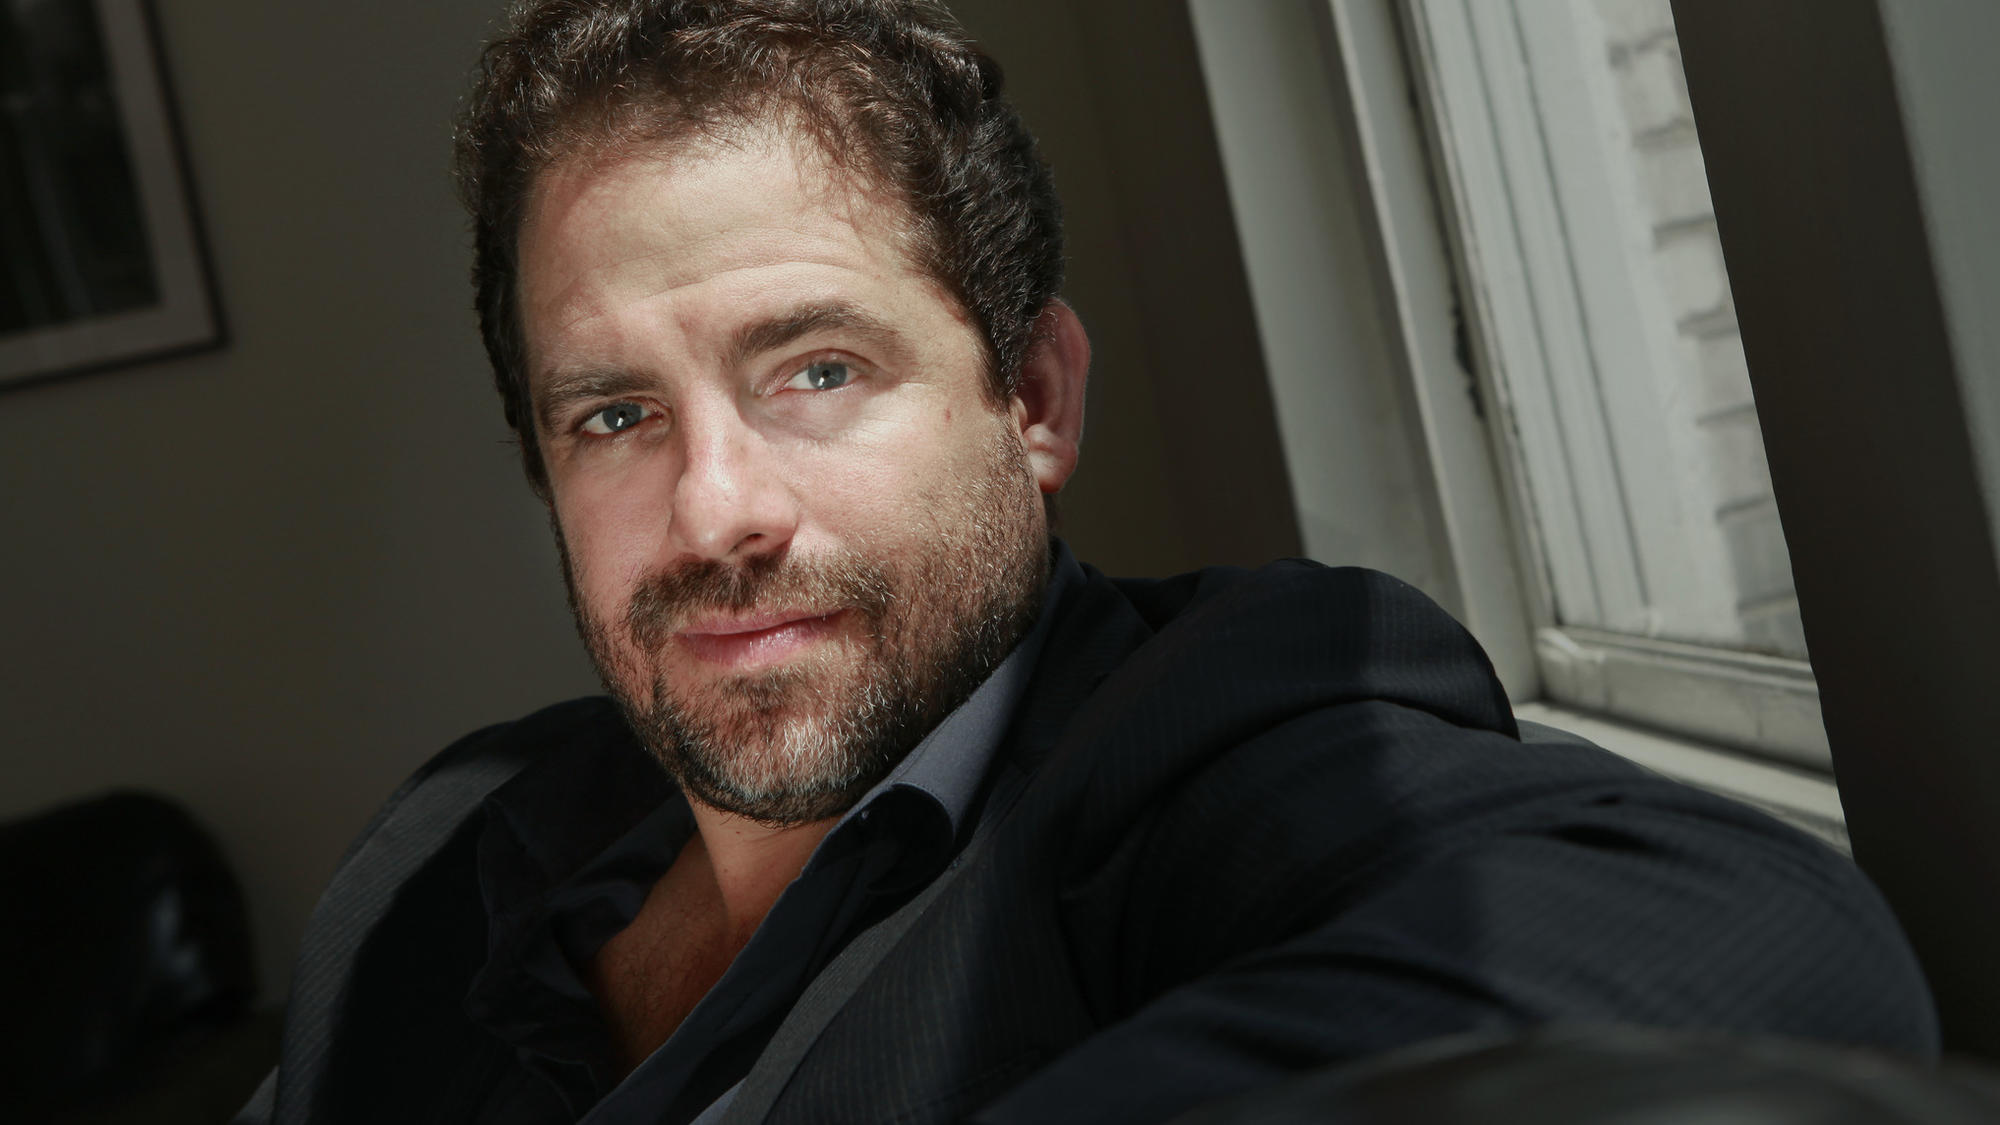 Six women accuse filmmaker Brett Ratner of sexual harassment